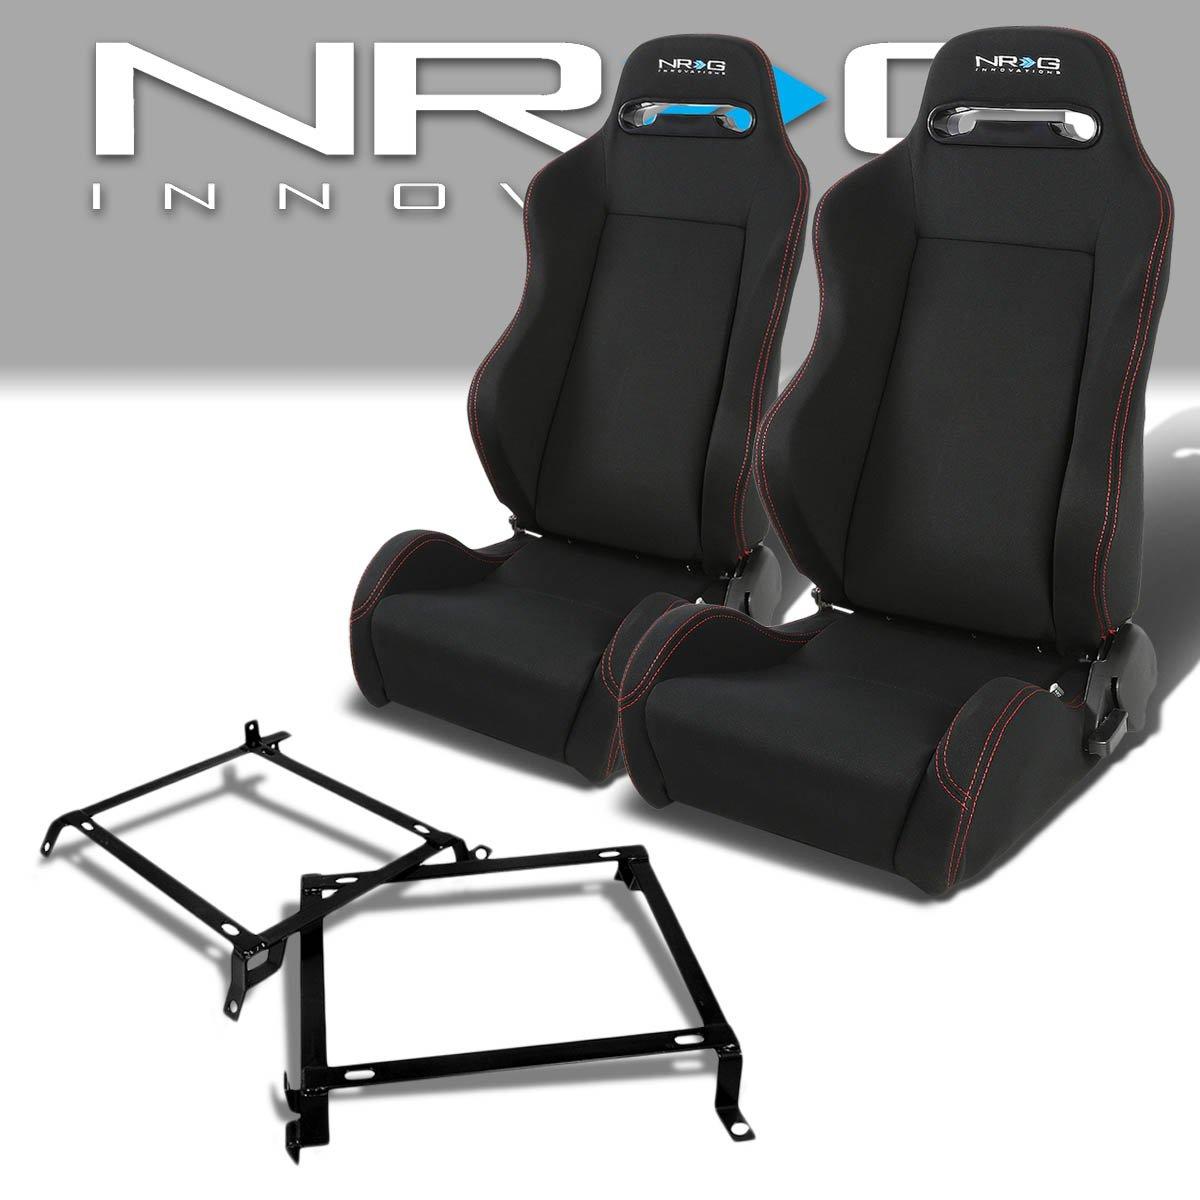 Pair of RSTRLGBK Racing Seats+Mounting Bracket for Honda Civic/Acura Integra Sedan & Coupe